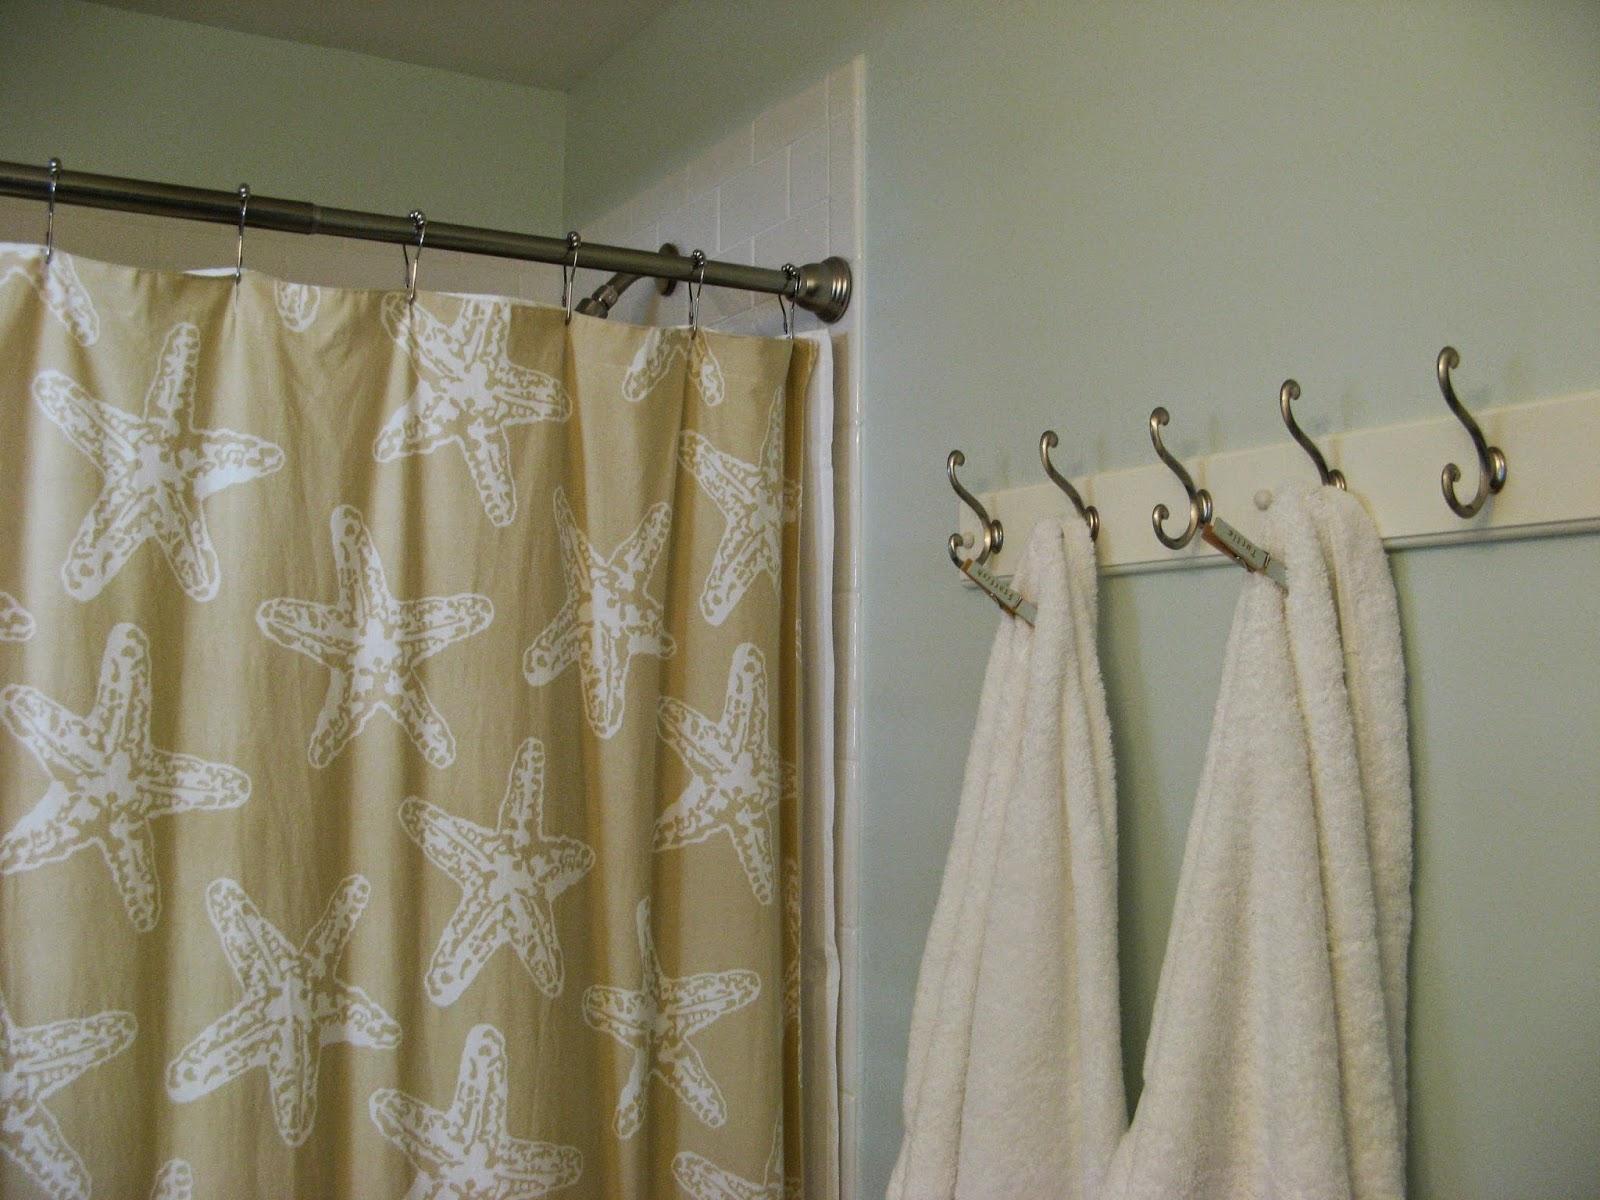 Bath Towel Charms